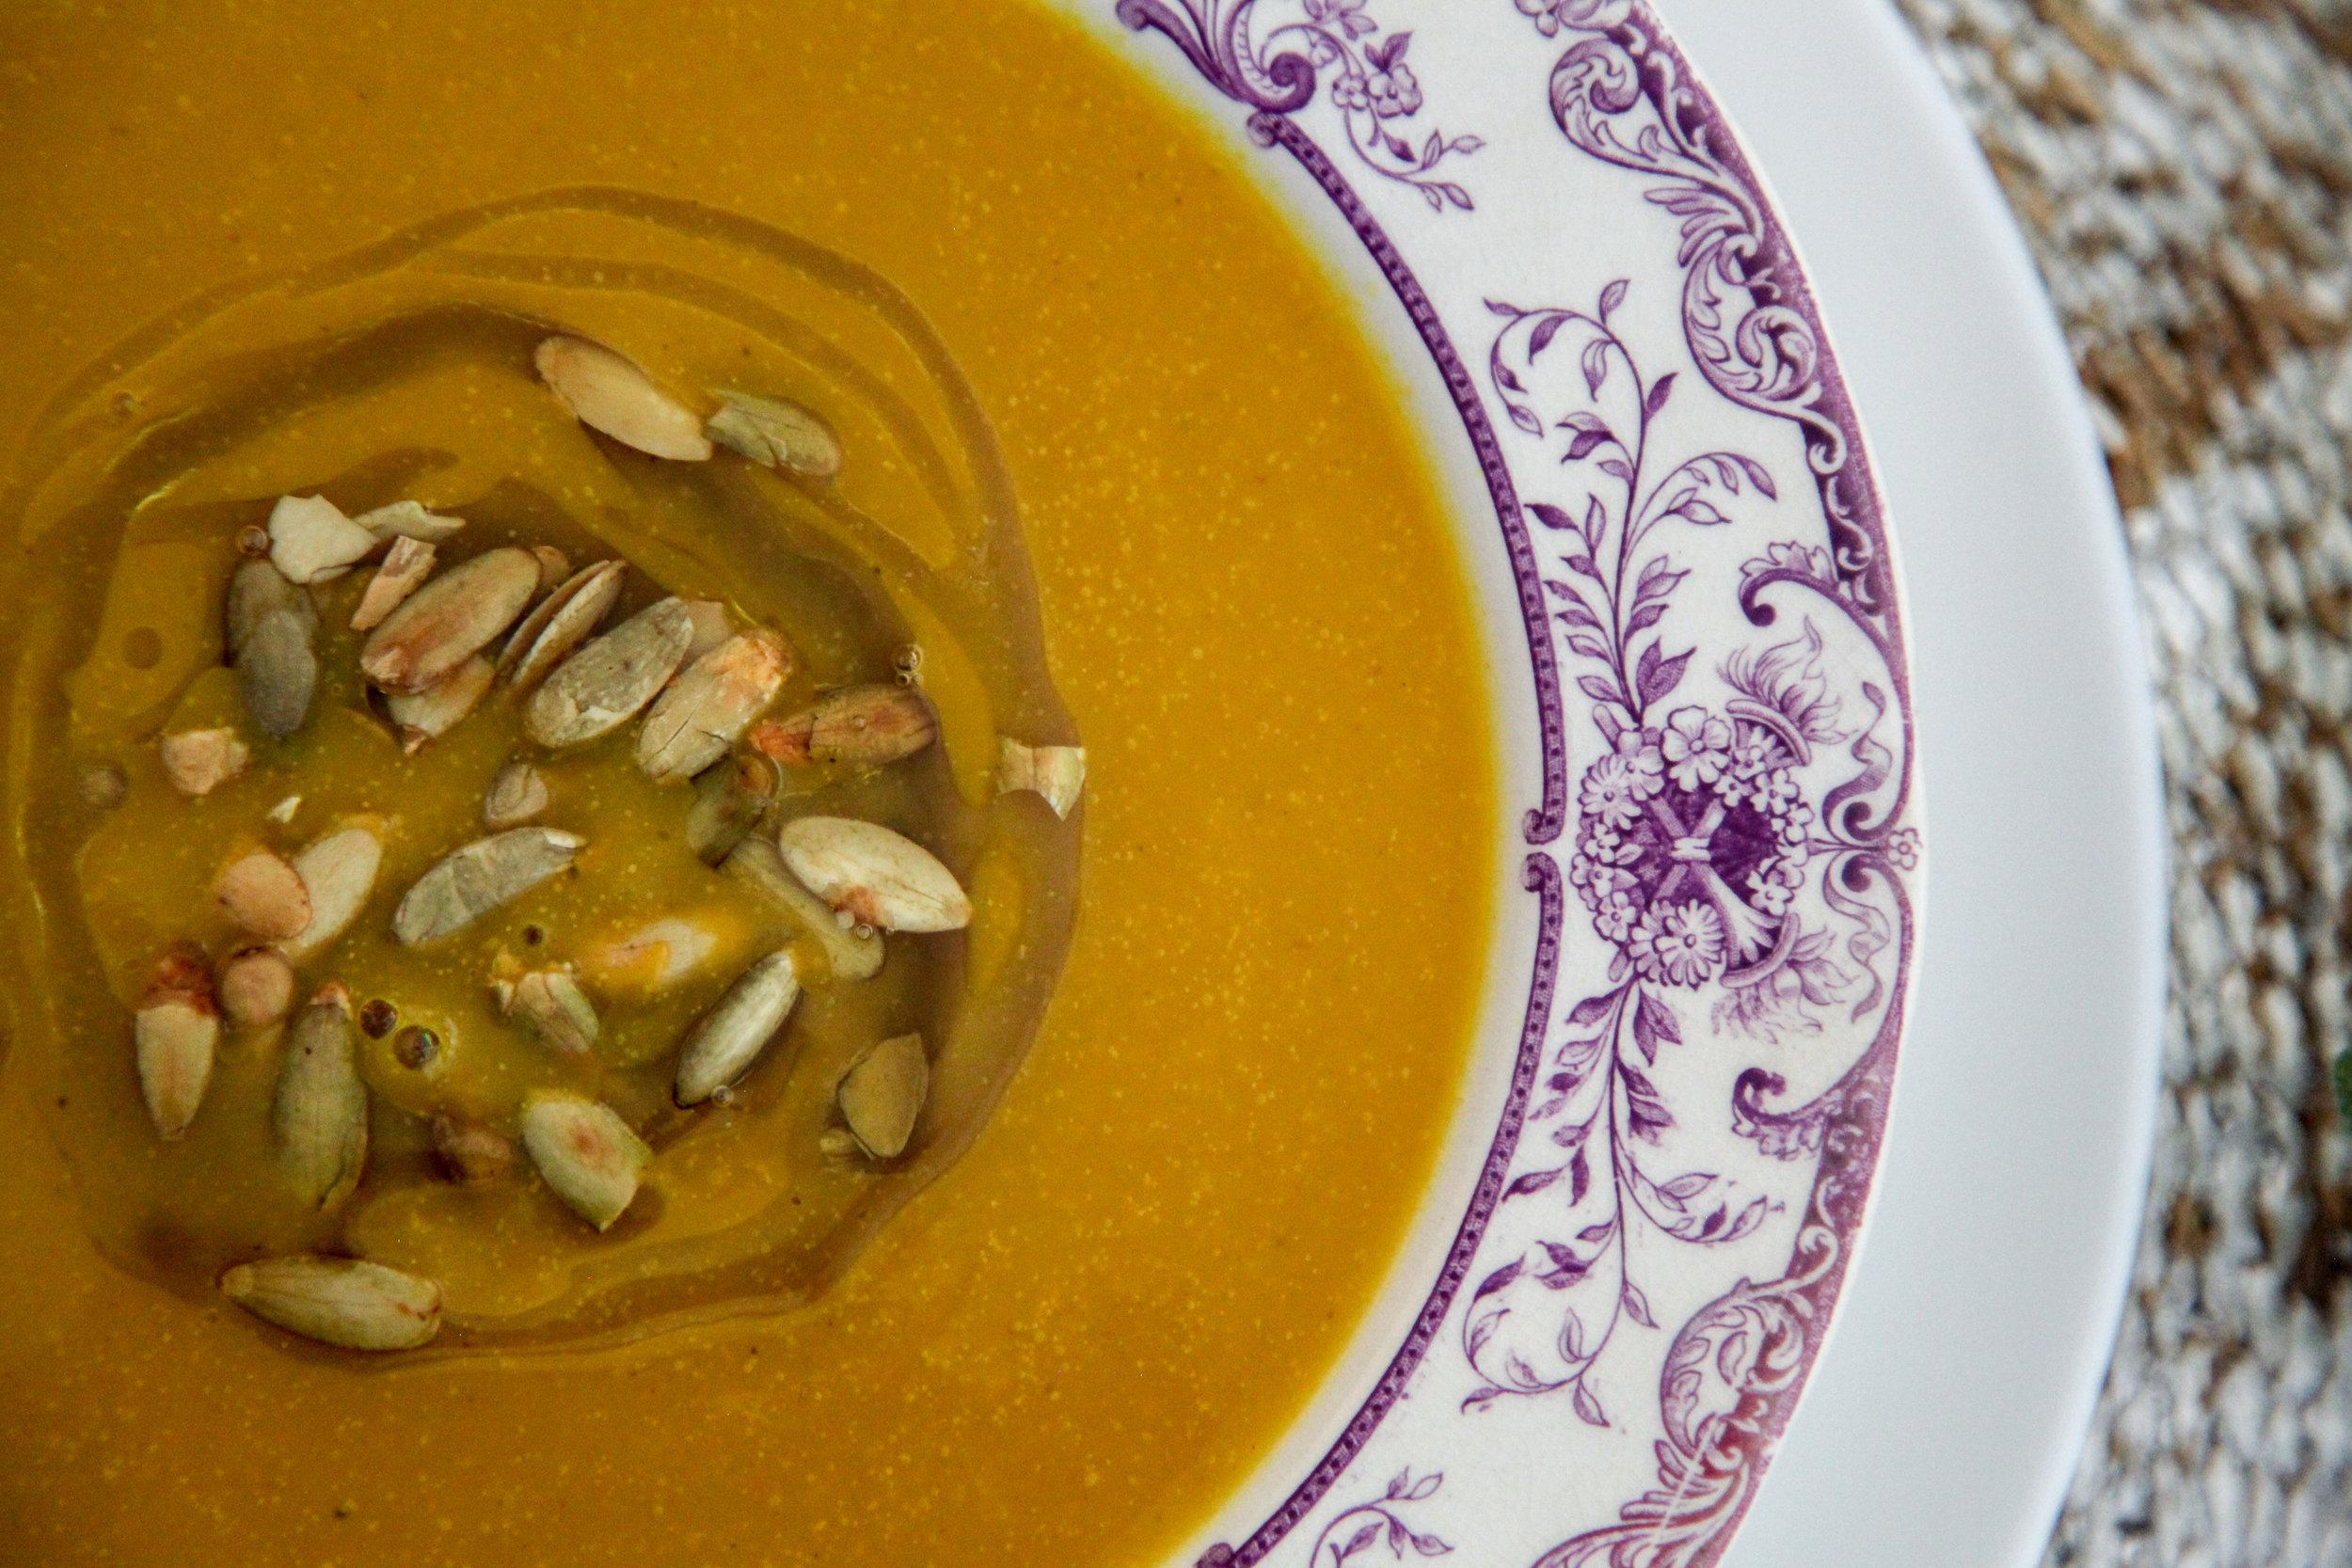 Butternut squash soup gets a kick